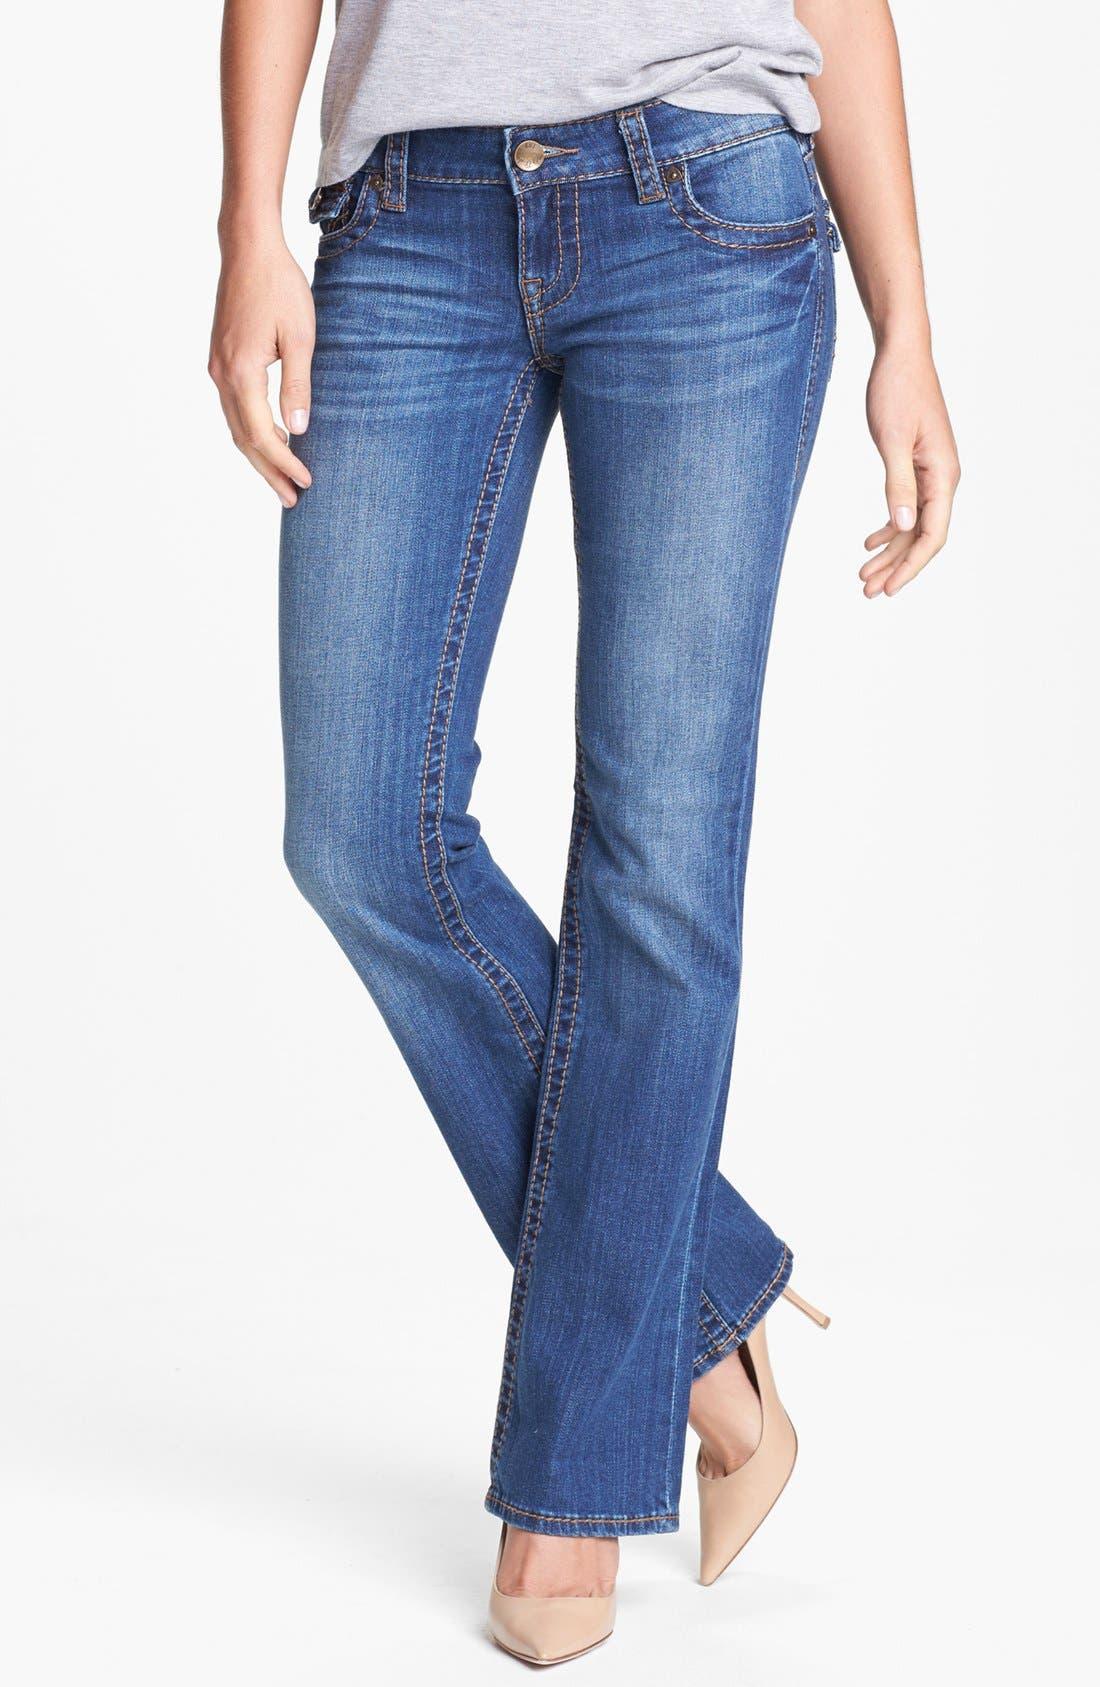 Alternate Image 1 Selected - KUT from the Kloth 'Kate' Bootcut Jeans (Regular & Tall) (Abundance)